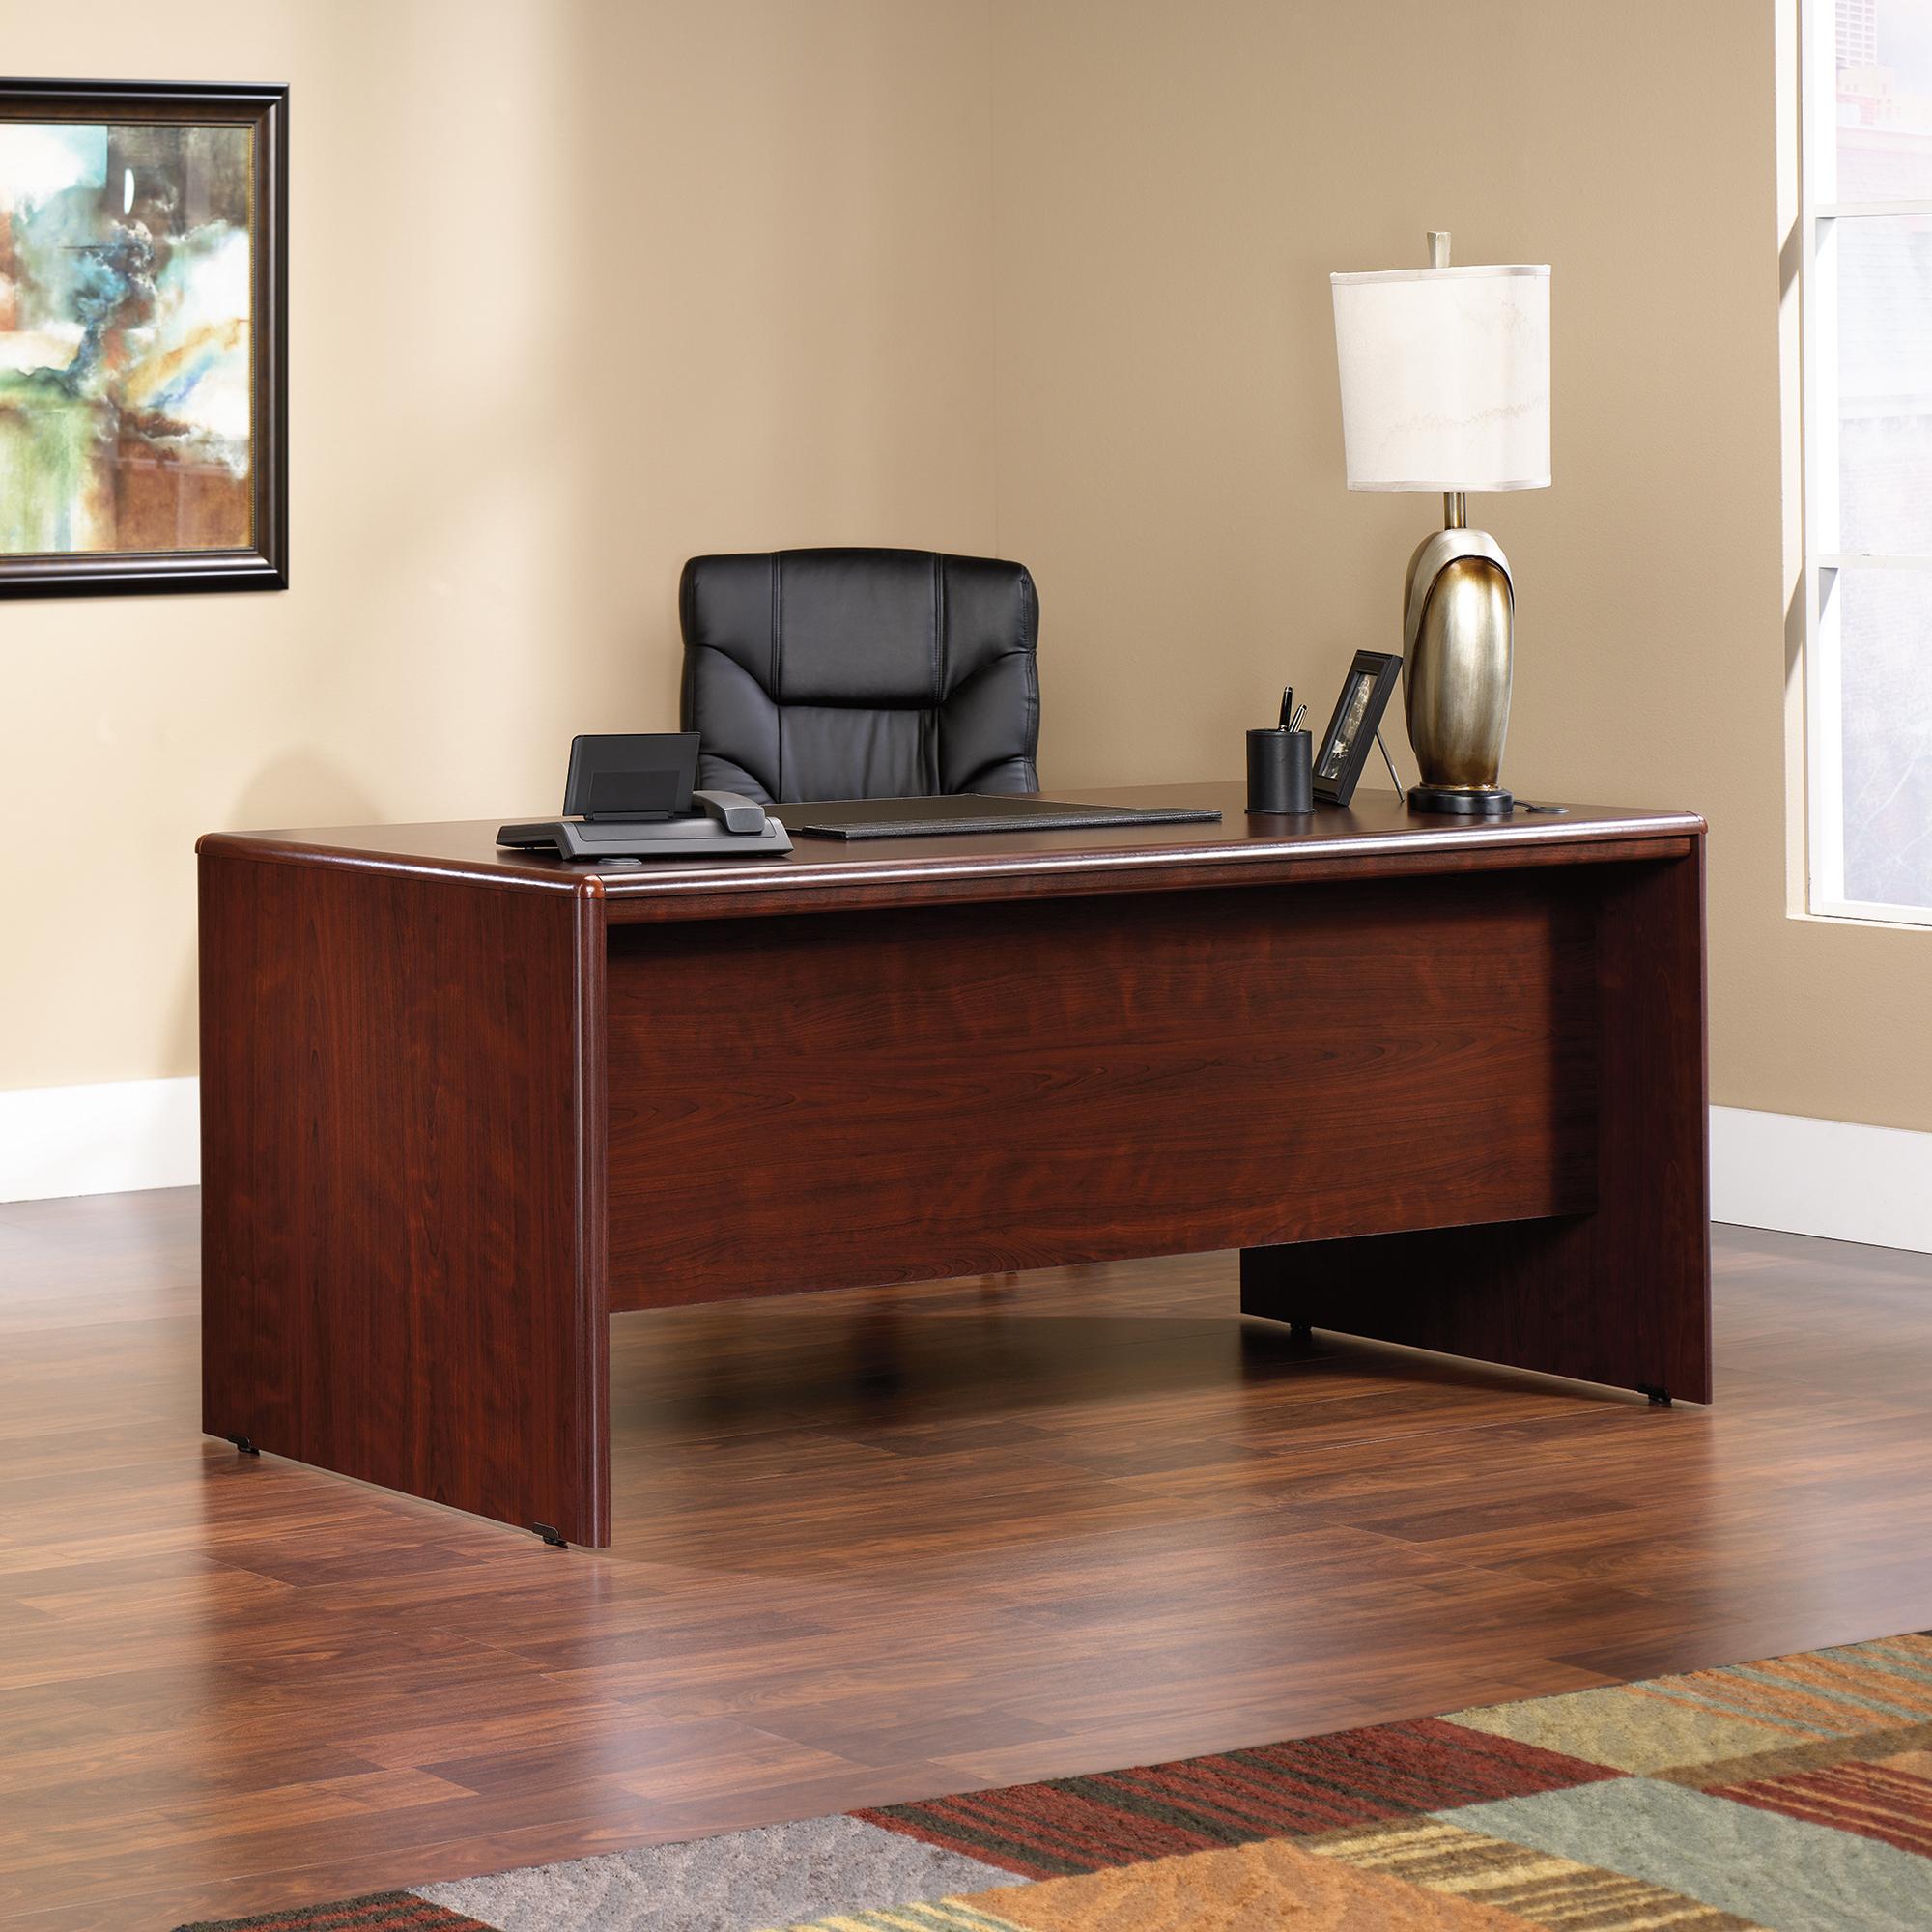 Sauder Cornerstone Executive Desk